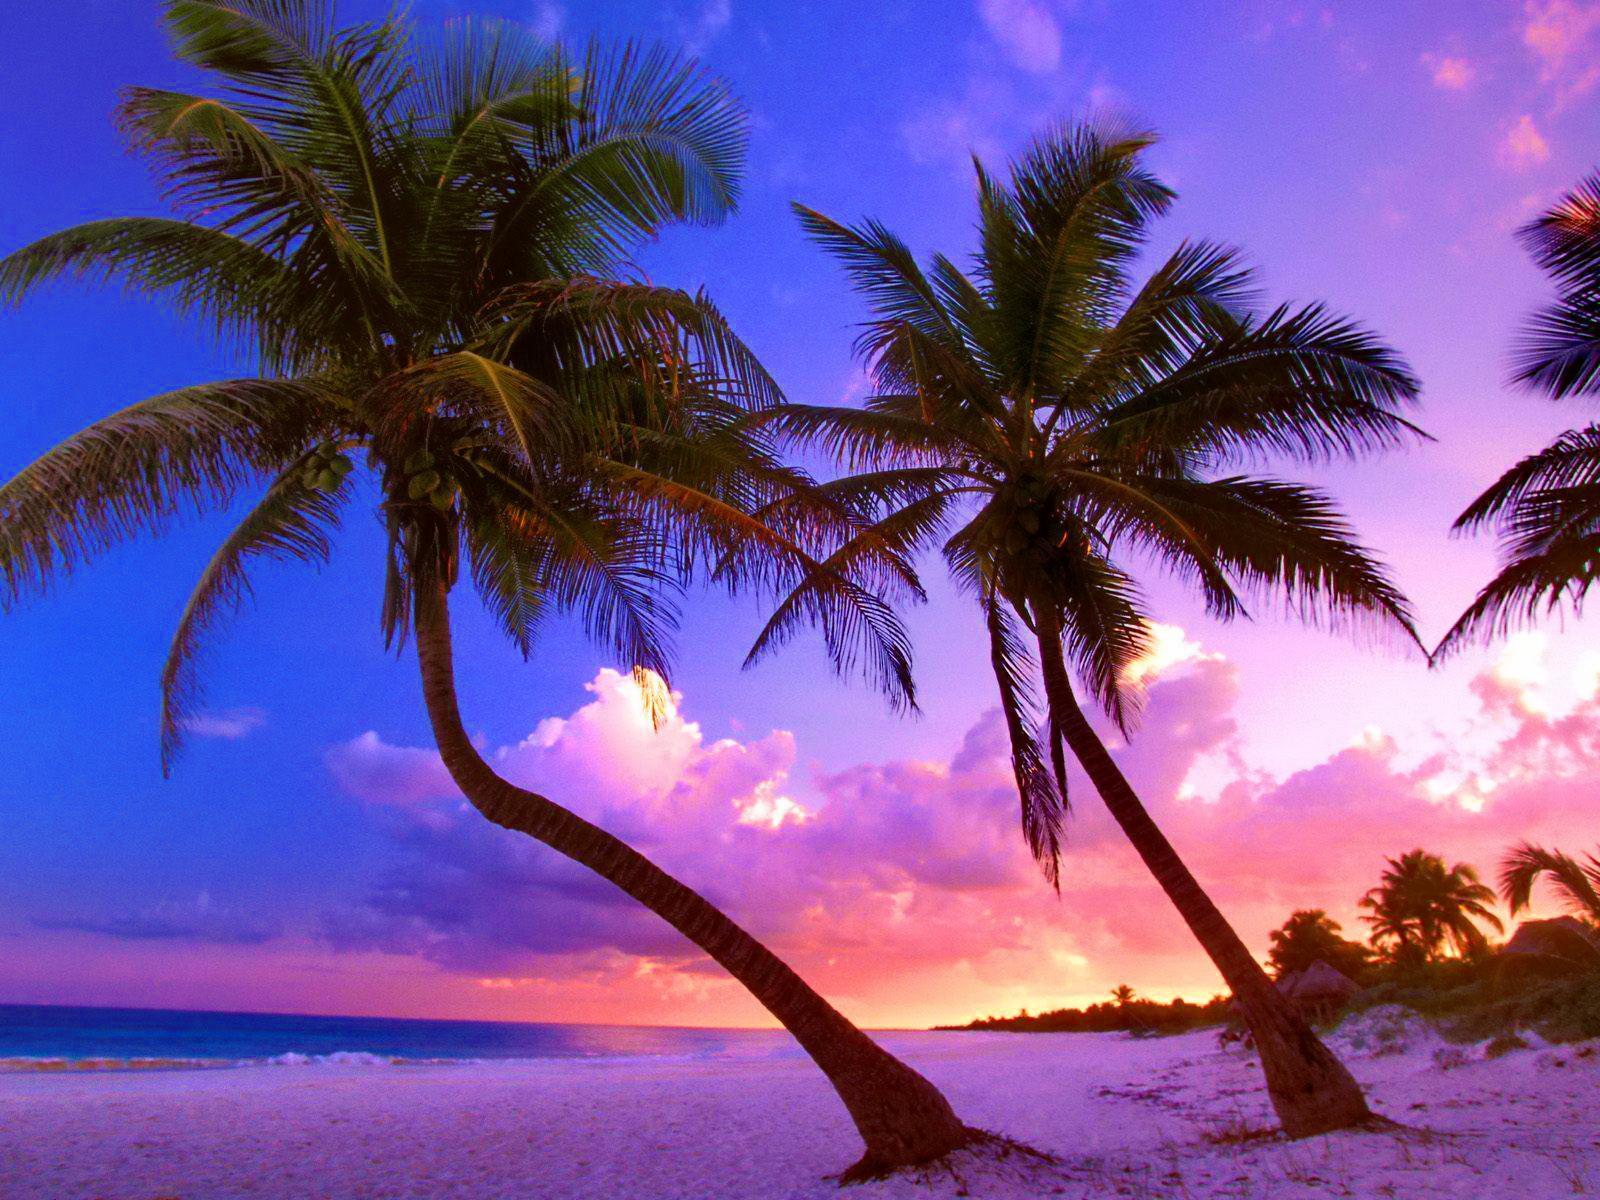 wallpaper Exotic beach near Cancun Mexico HD Widescreen 1600x1200